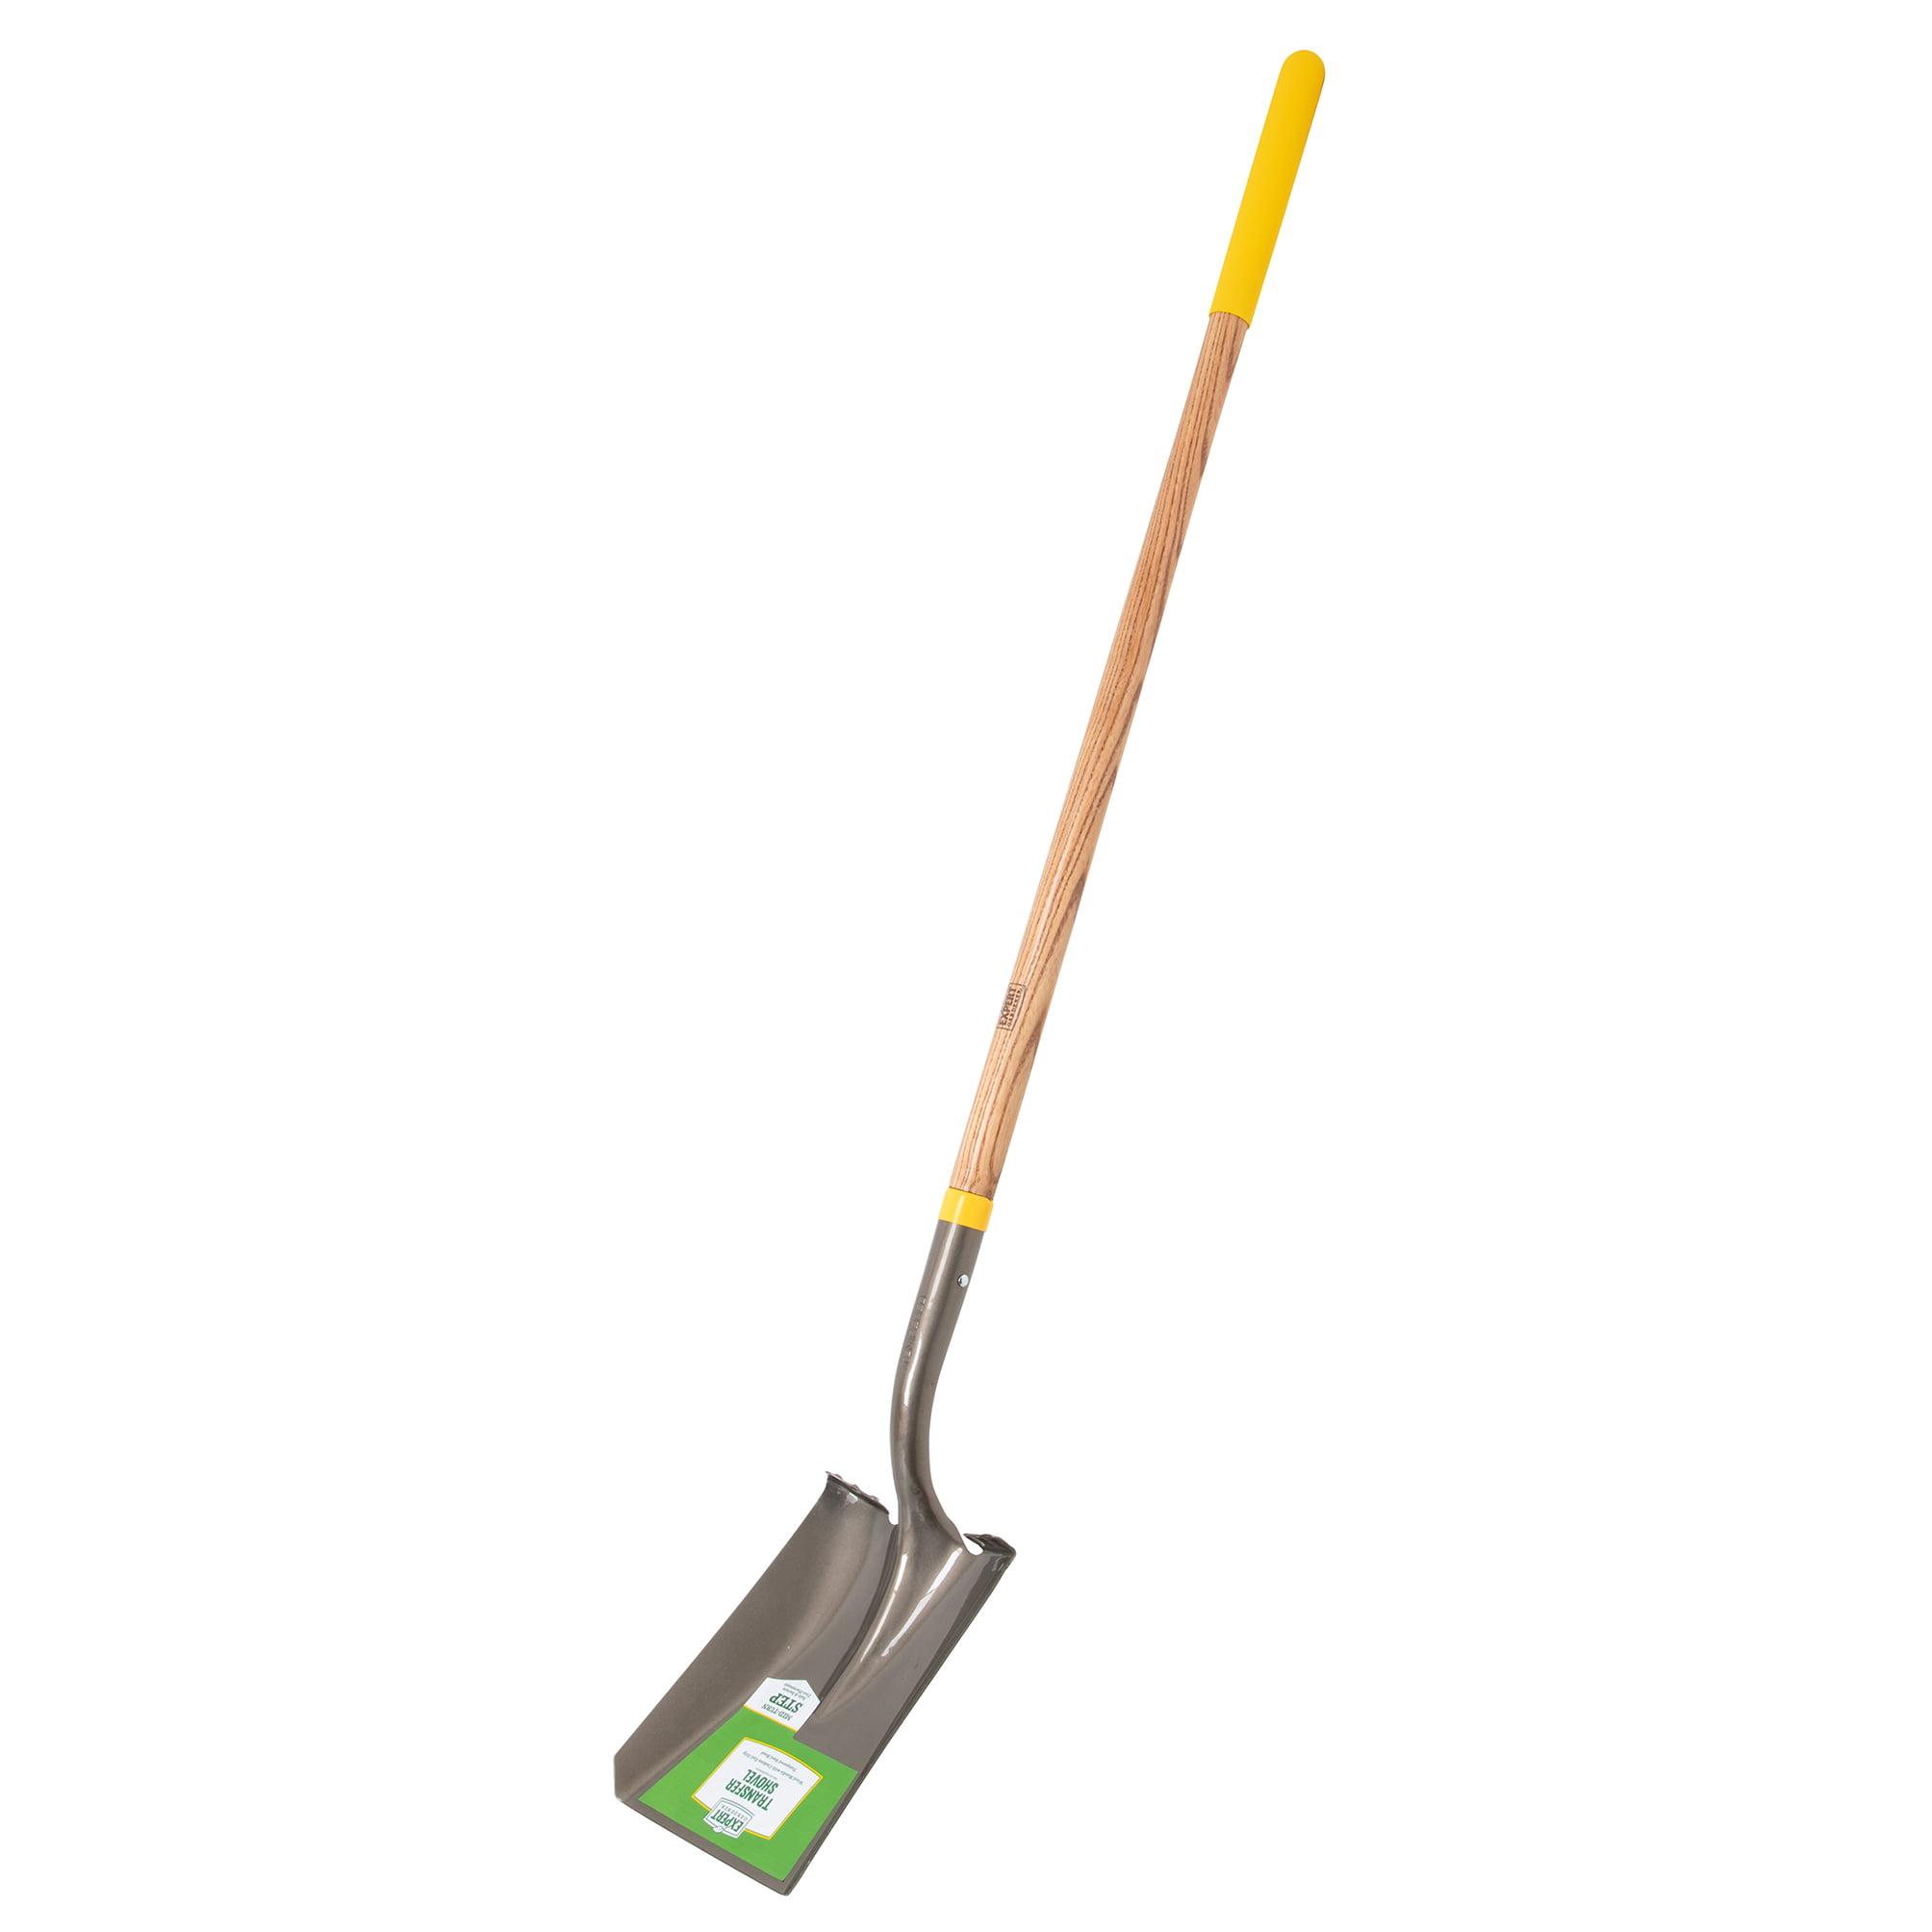 Forks and Shovels 2pcs Snow Shovel D Grip Handle Replacement Fits for Spades